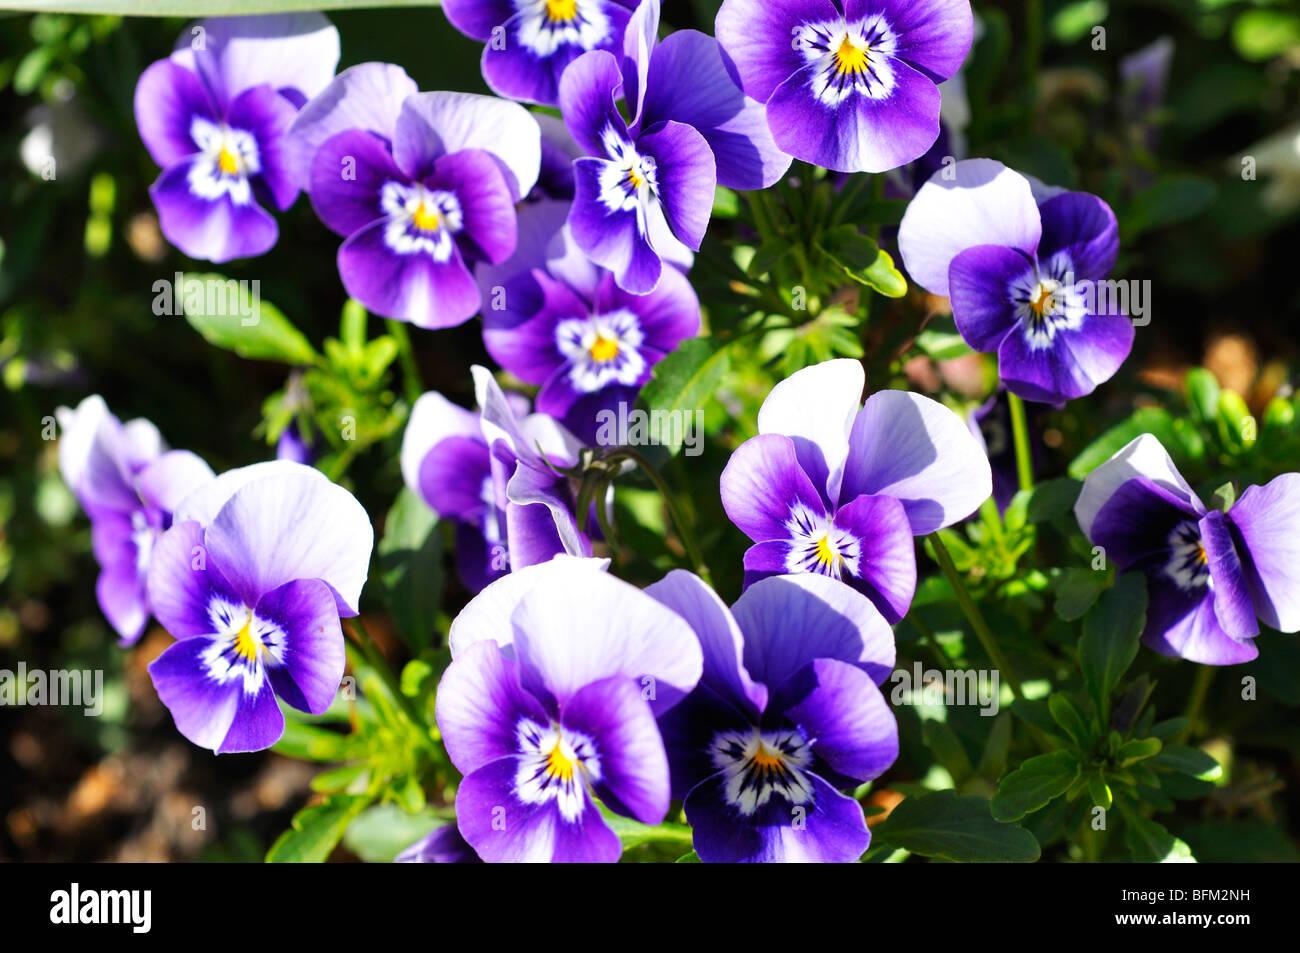 Pansies aka pansy violets (Viola tricolor hortensis) - Stock Image